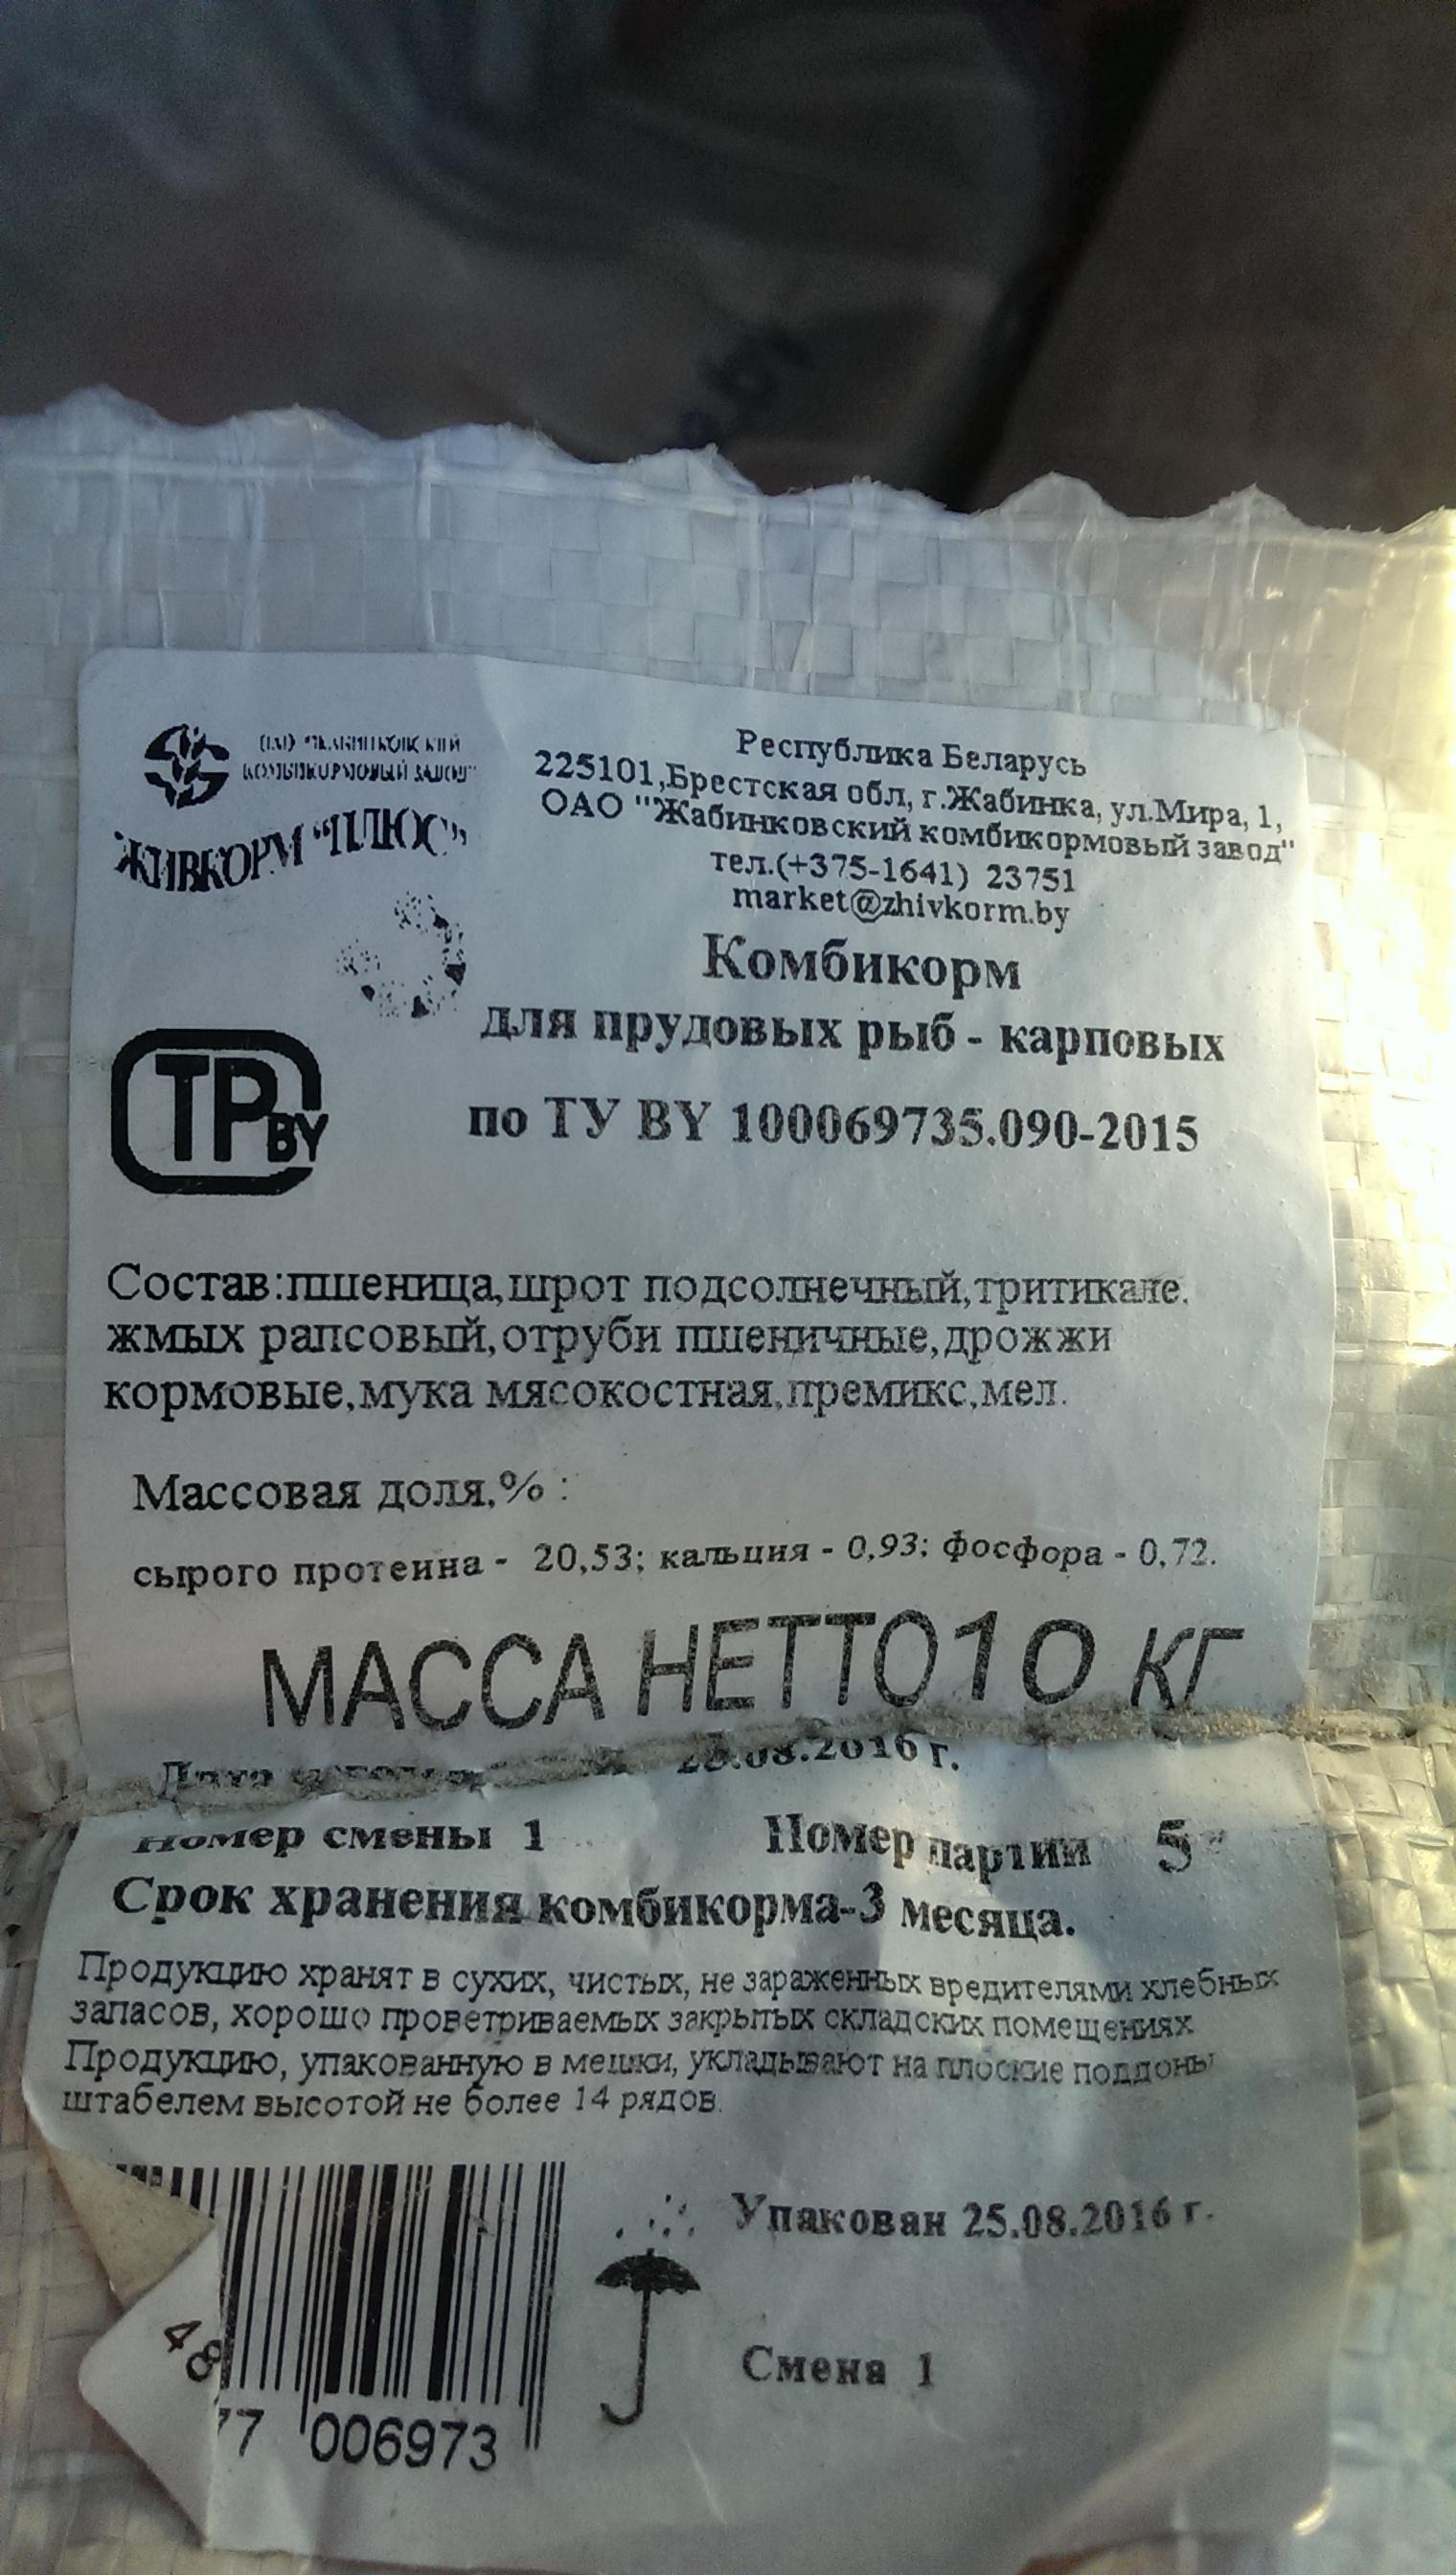 http://s4.uploads.ru/ultHh.jpg